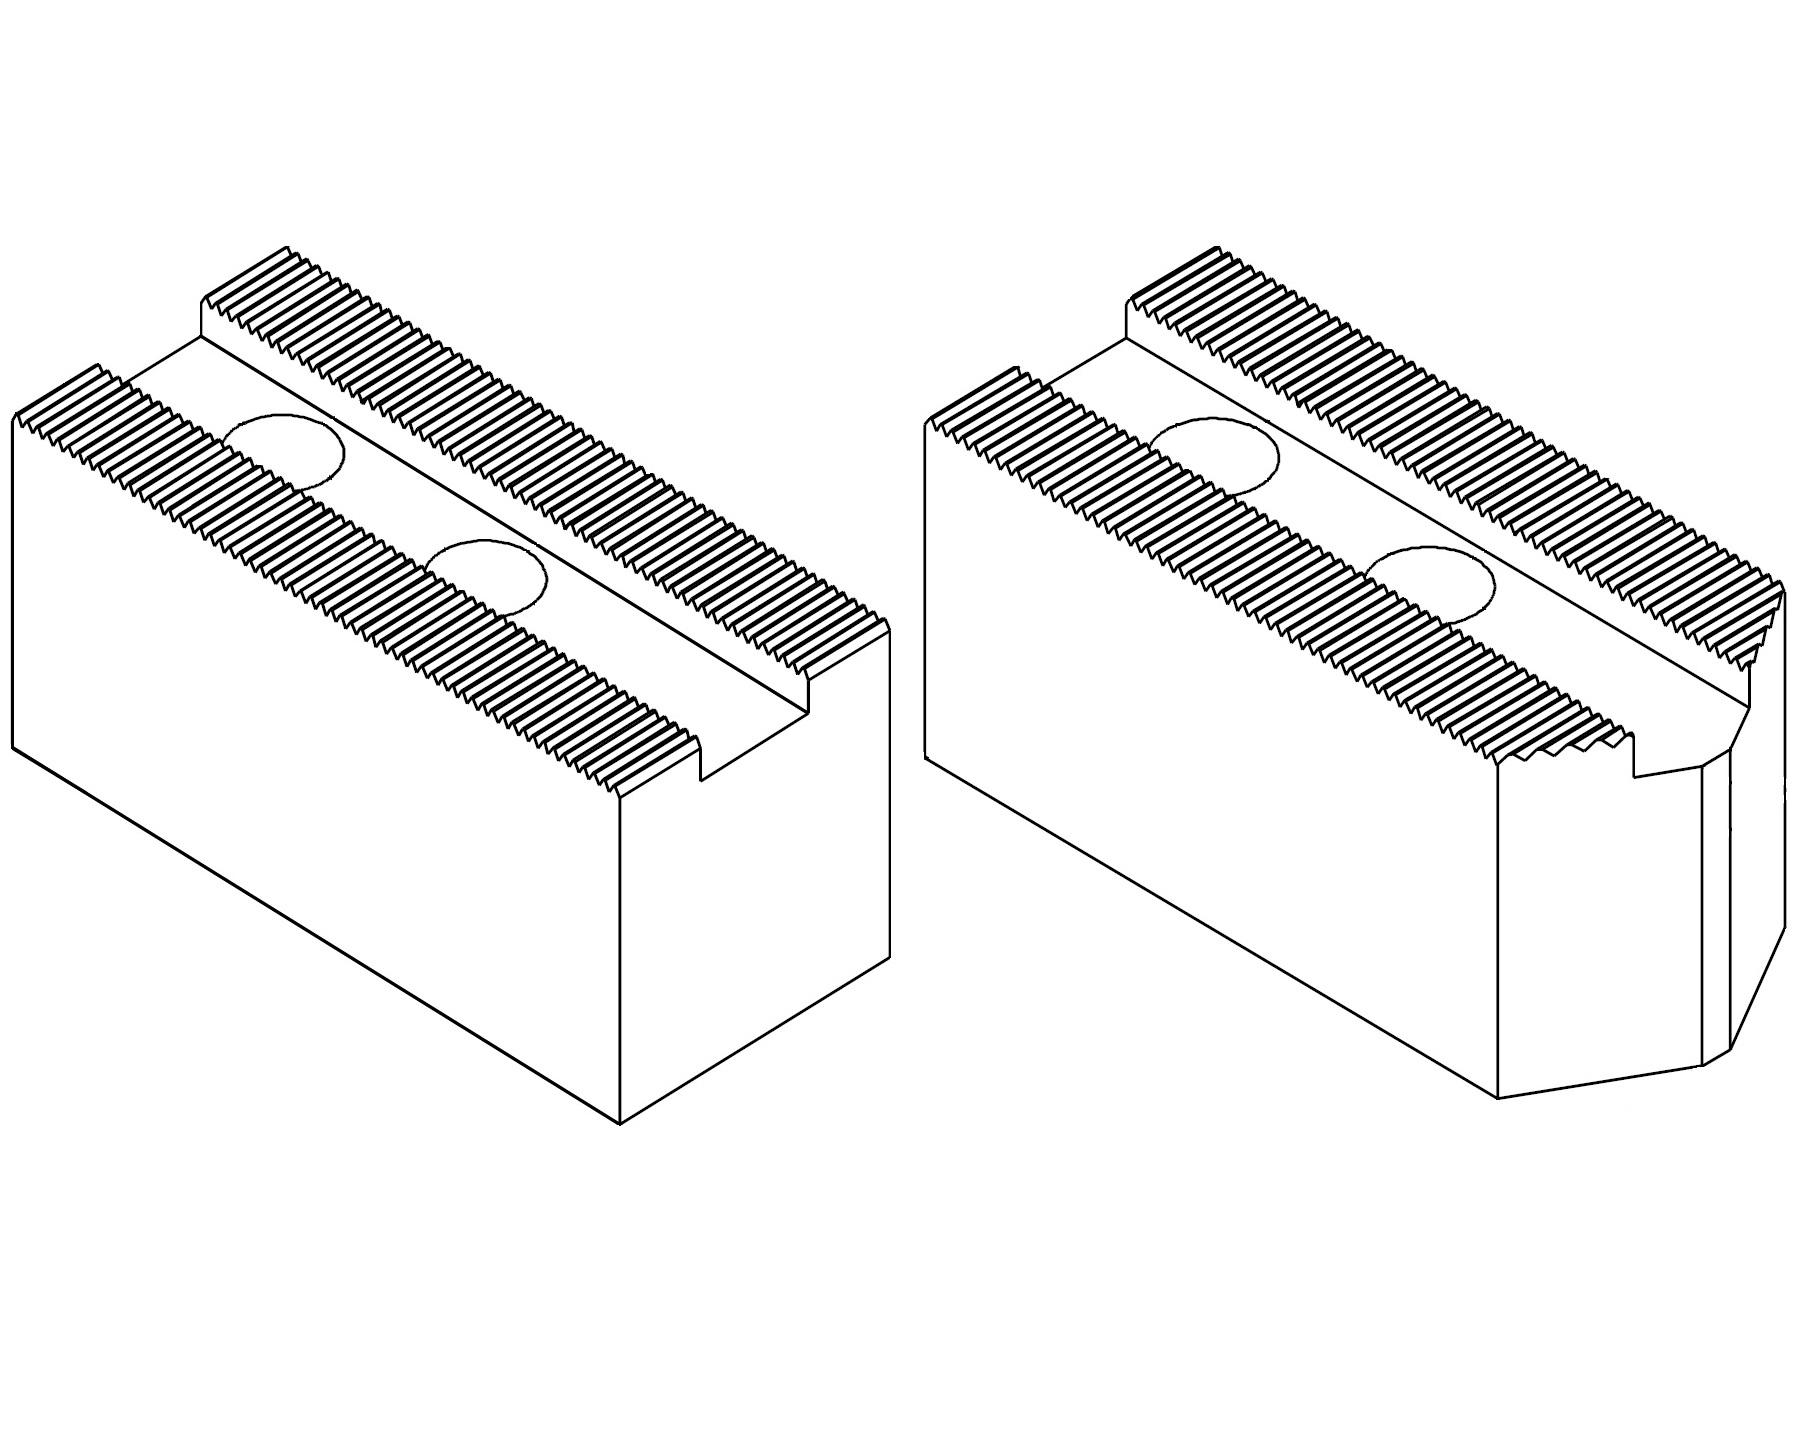 "Čelisti měkké 1/16""x90°, šířka drážky - 21 (sklíčidla pr. 200 - 400 mm)"